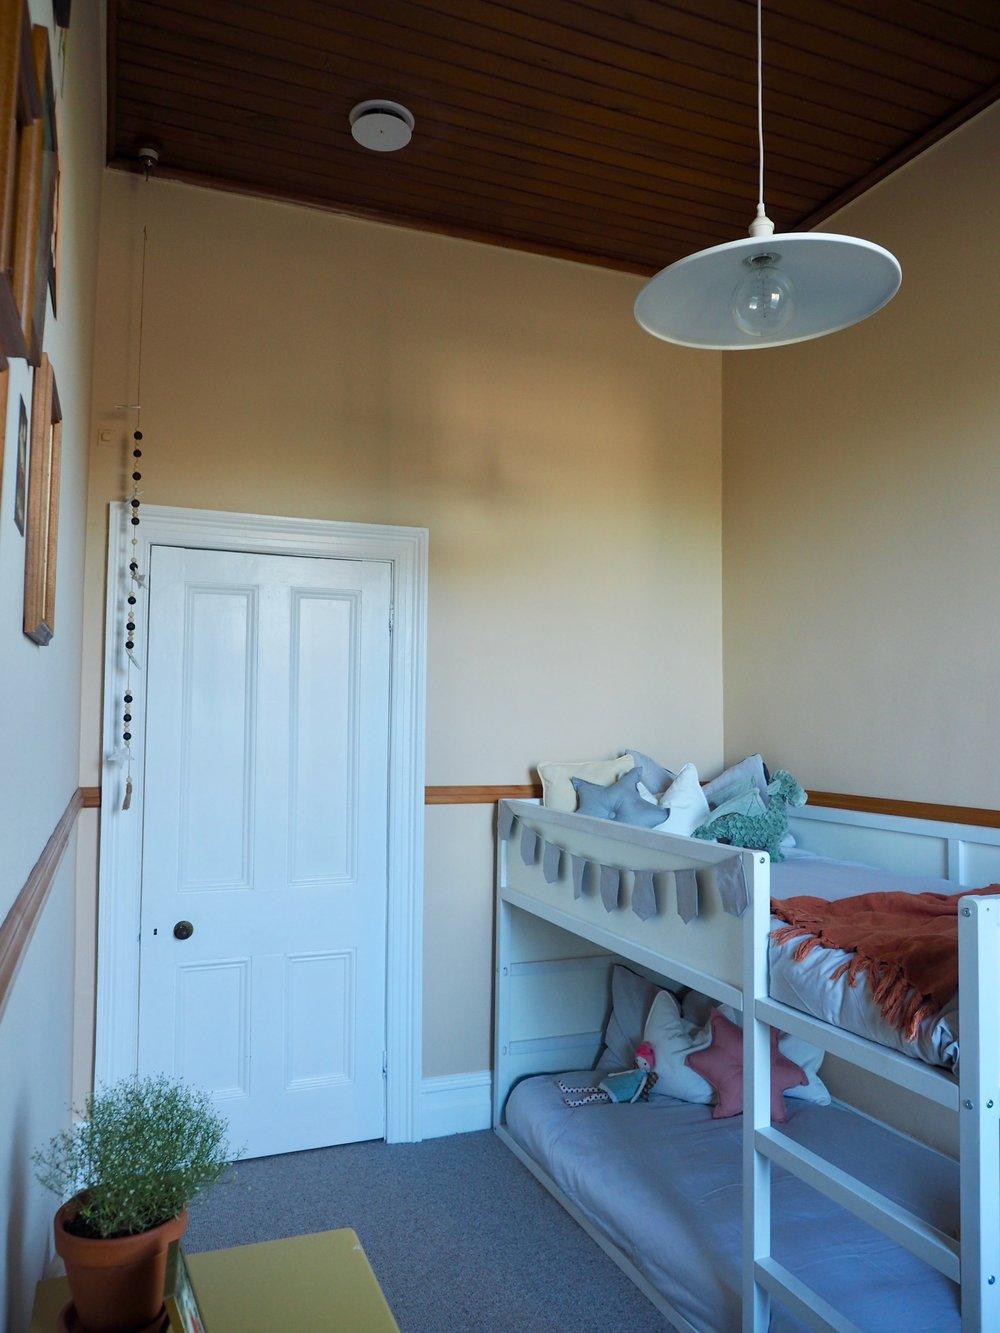 Pearson + Projects Shared Kids Bedroom Sand Resene - 16.jpg